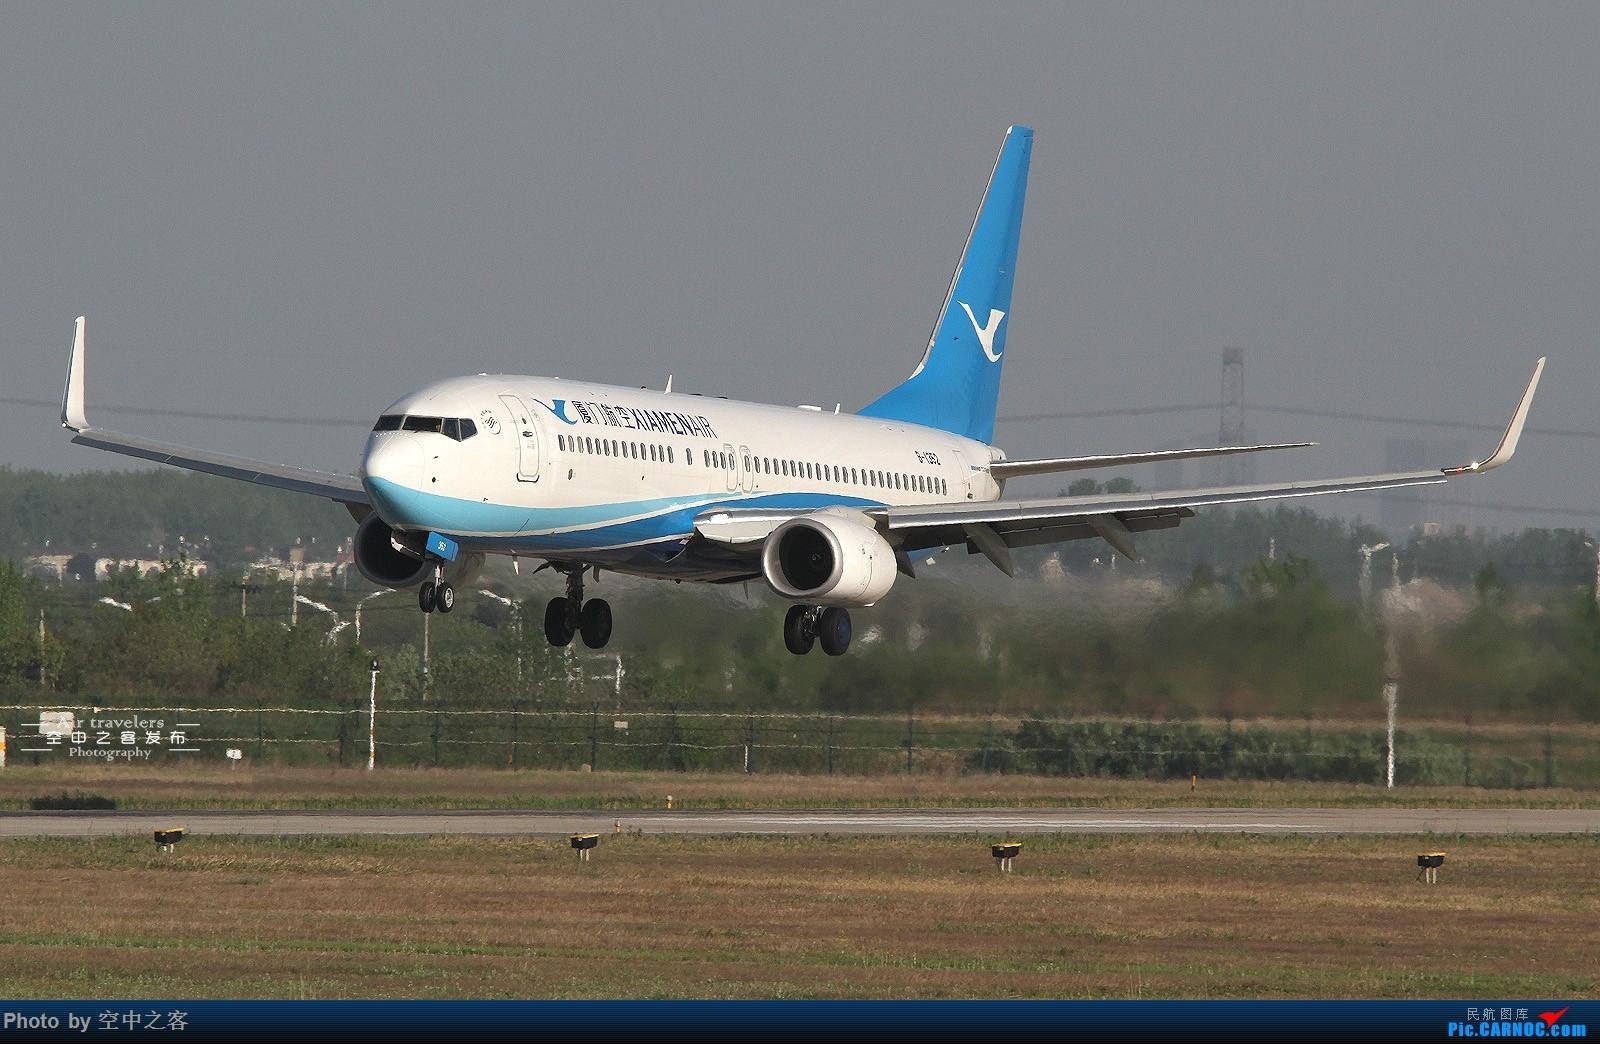 Re:[原创][合肥飞友会-霸都打机队 空中之客发布]去新桥机场散散心 738居多 BOEING 737-800 B-1352 合肥新桥国际机场